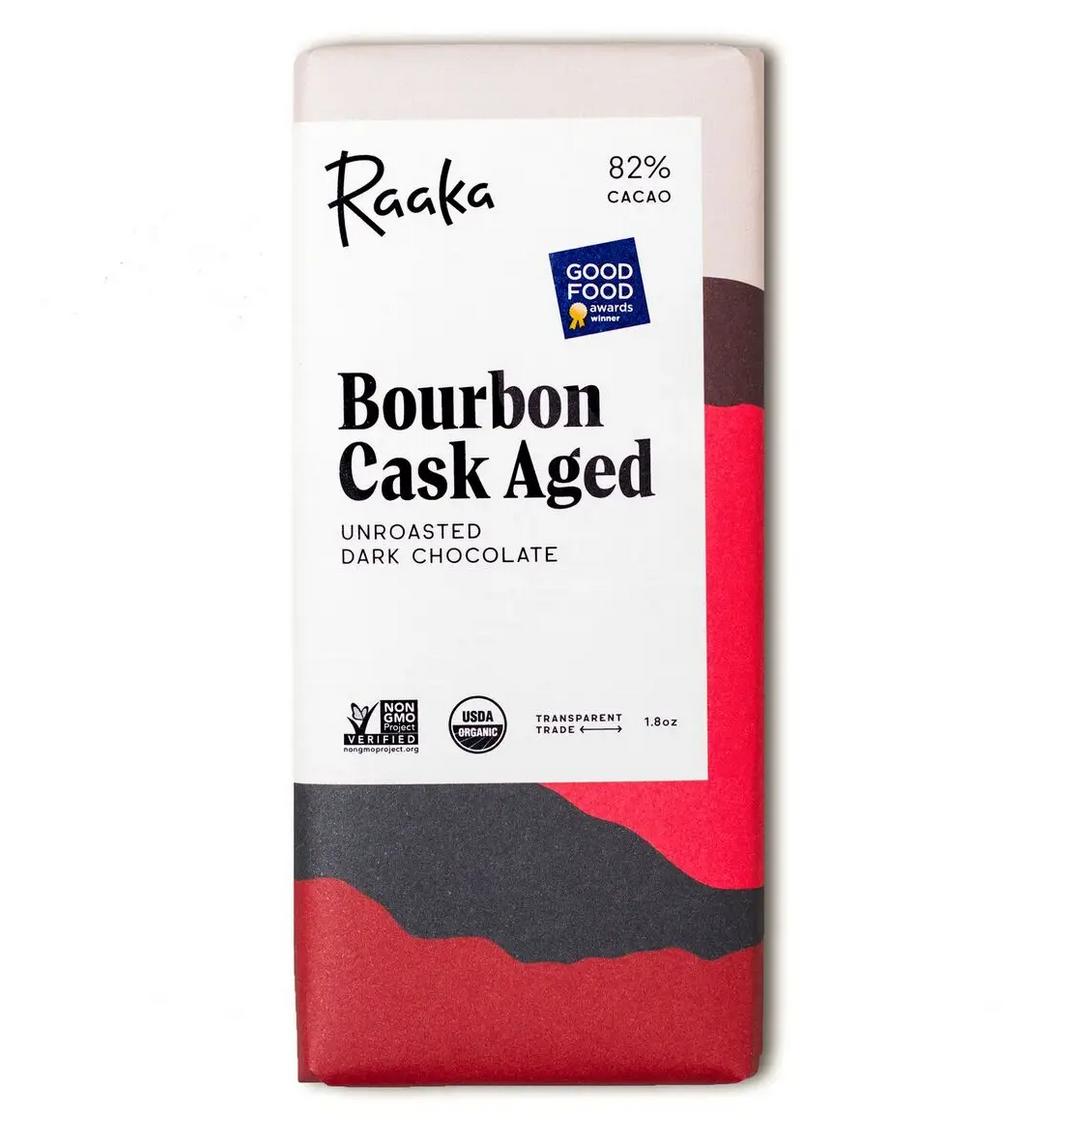 Raaka Chocolate 82% Bourbon Cask Aged Chocolate Bar